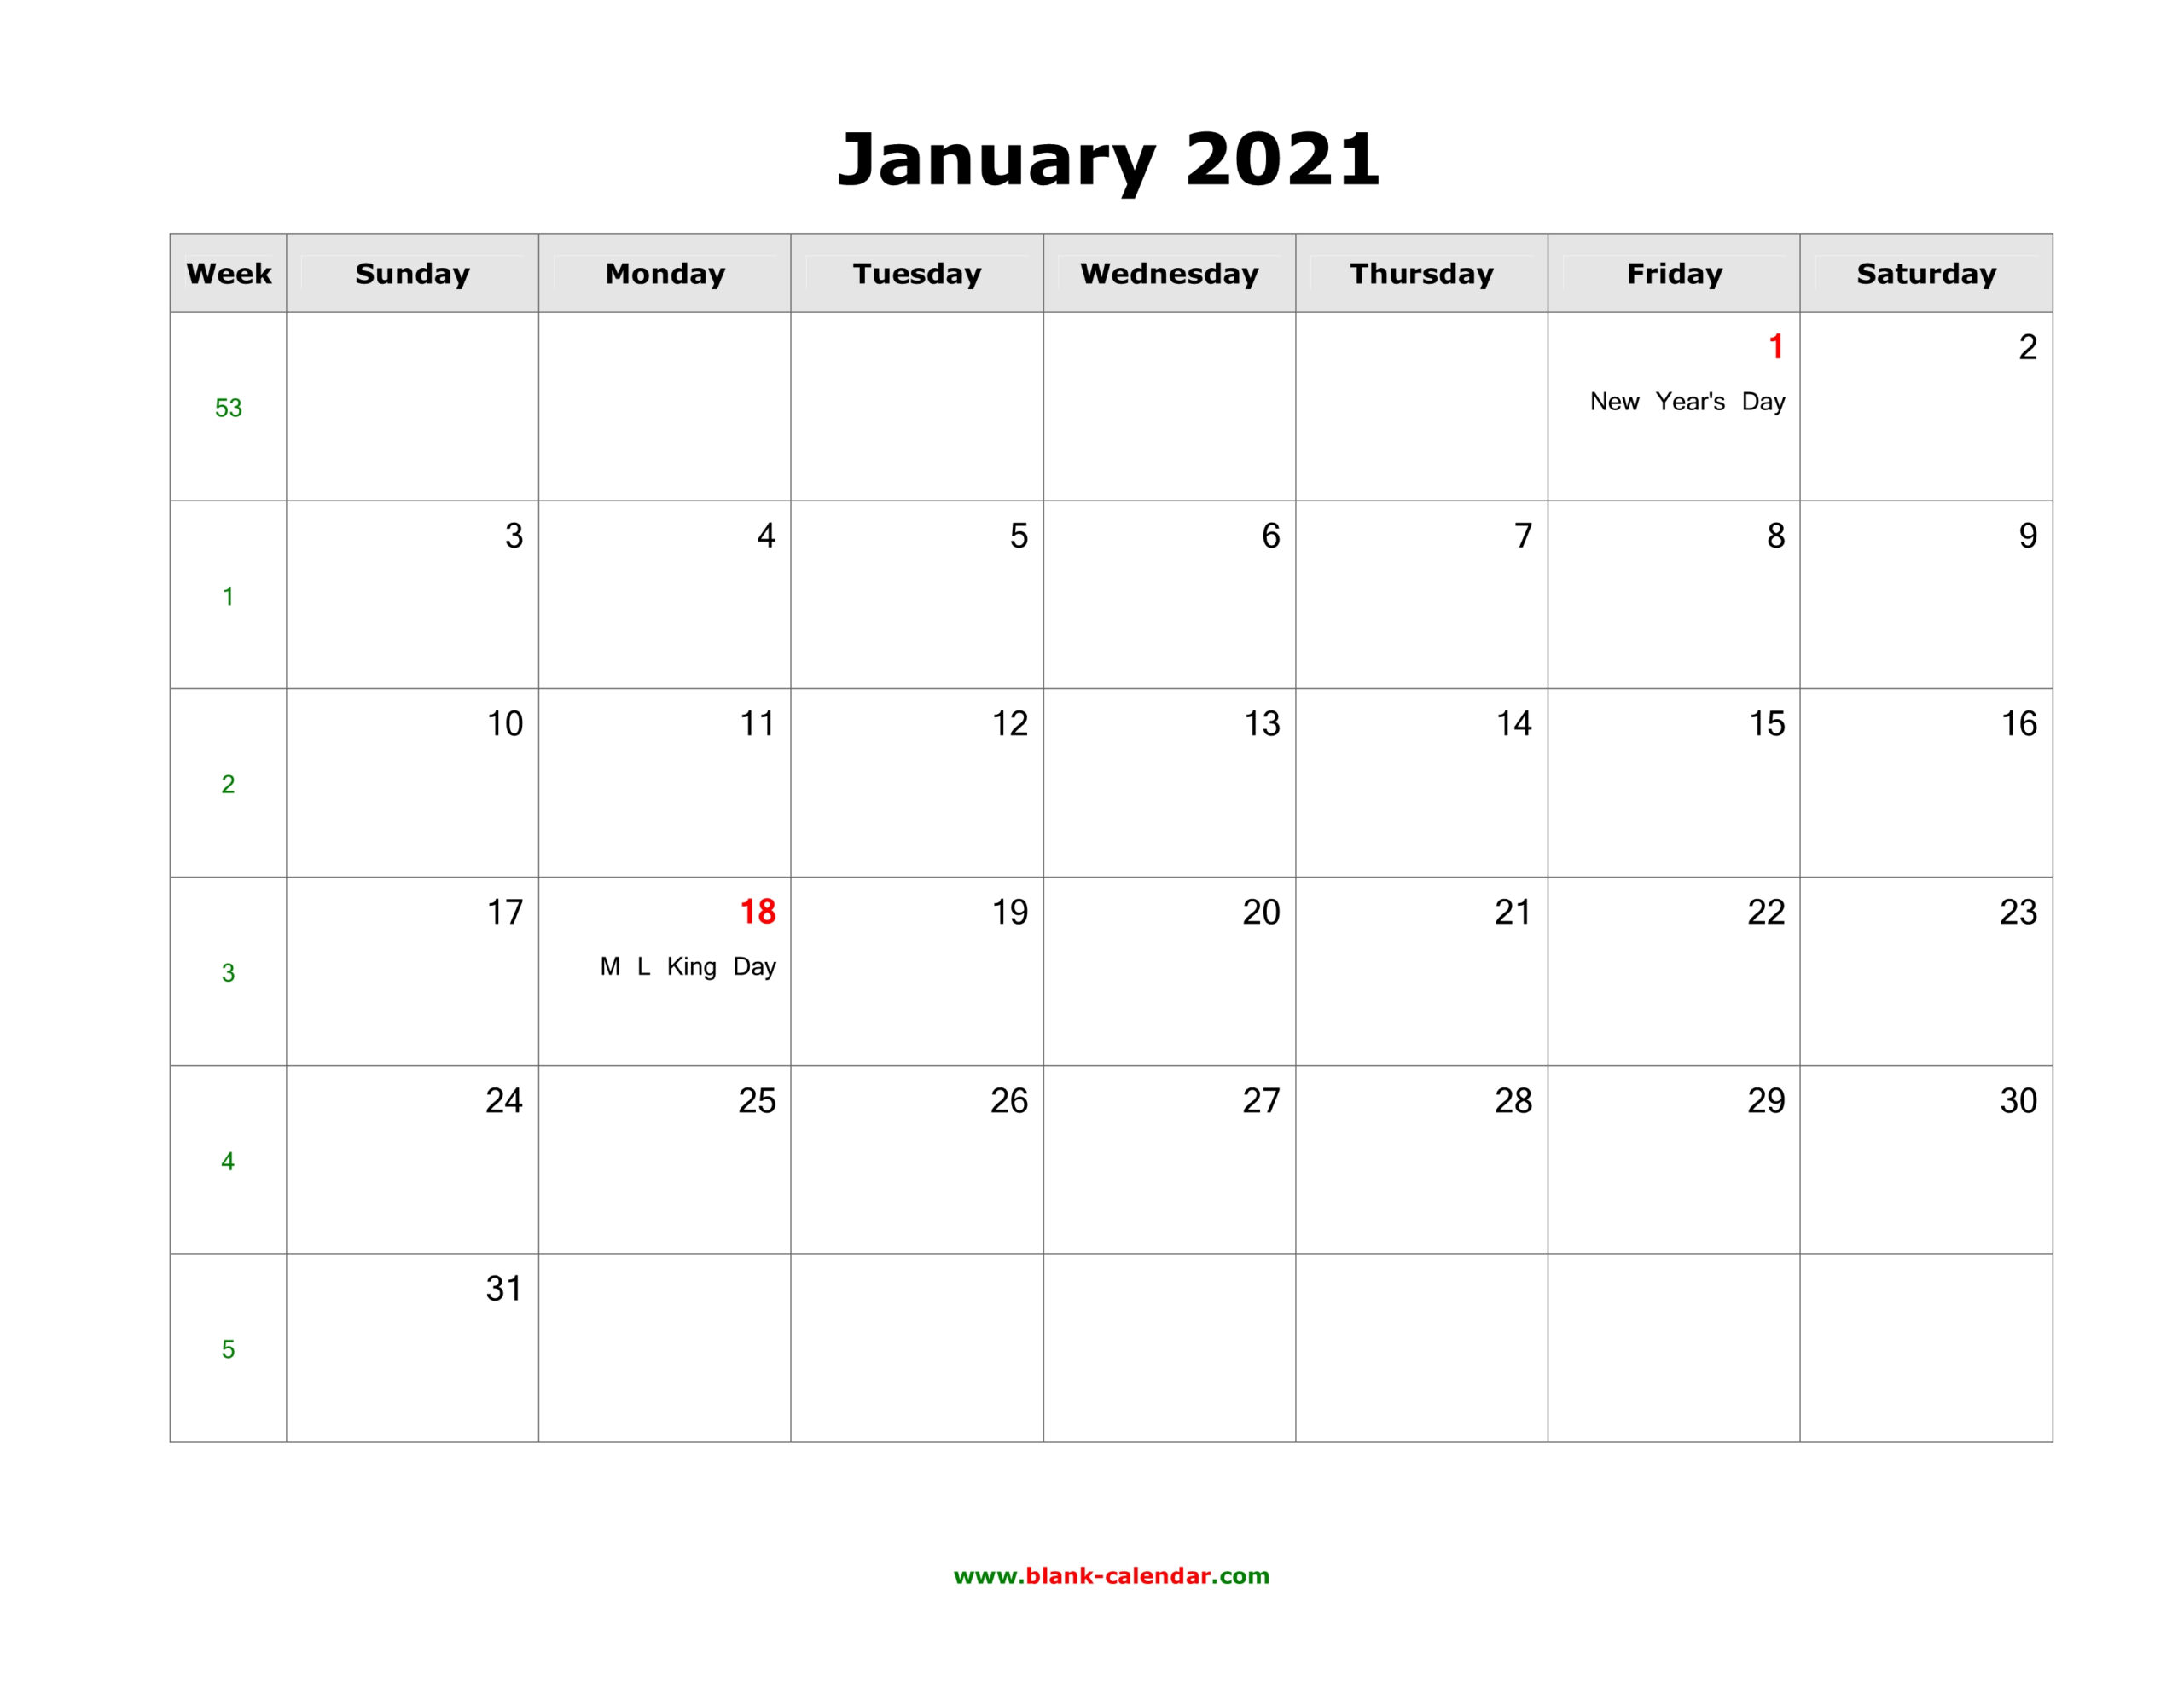 January 2021 Blank Calendar   Free Download Calendar Templates